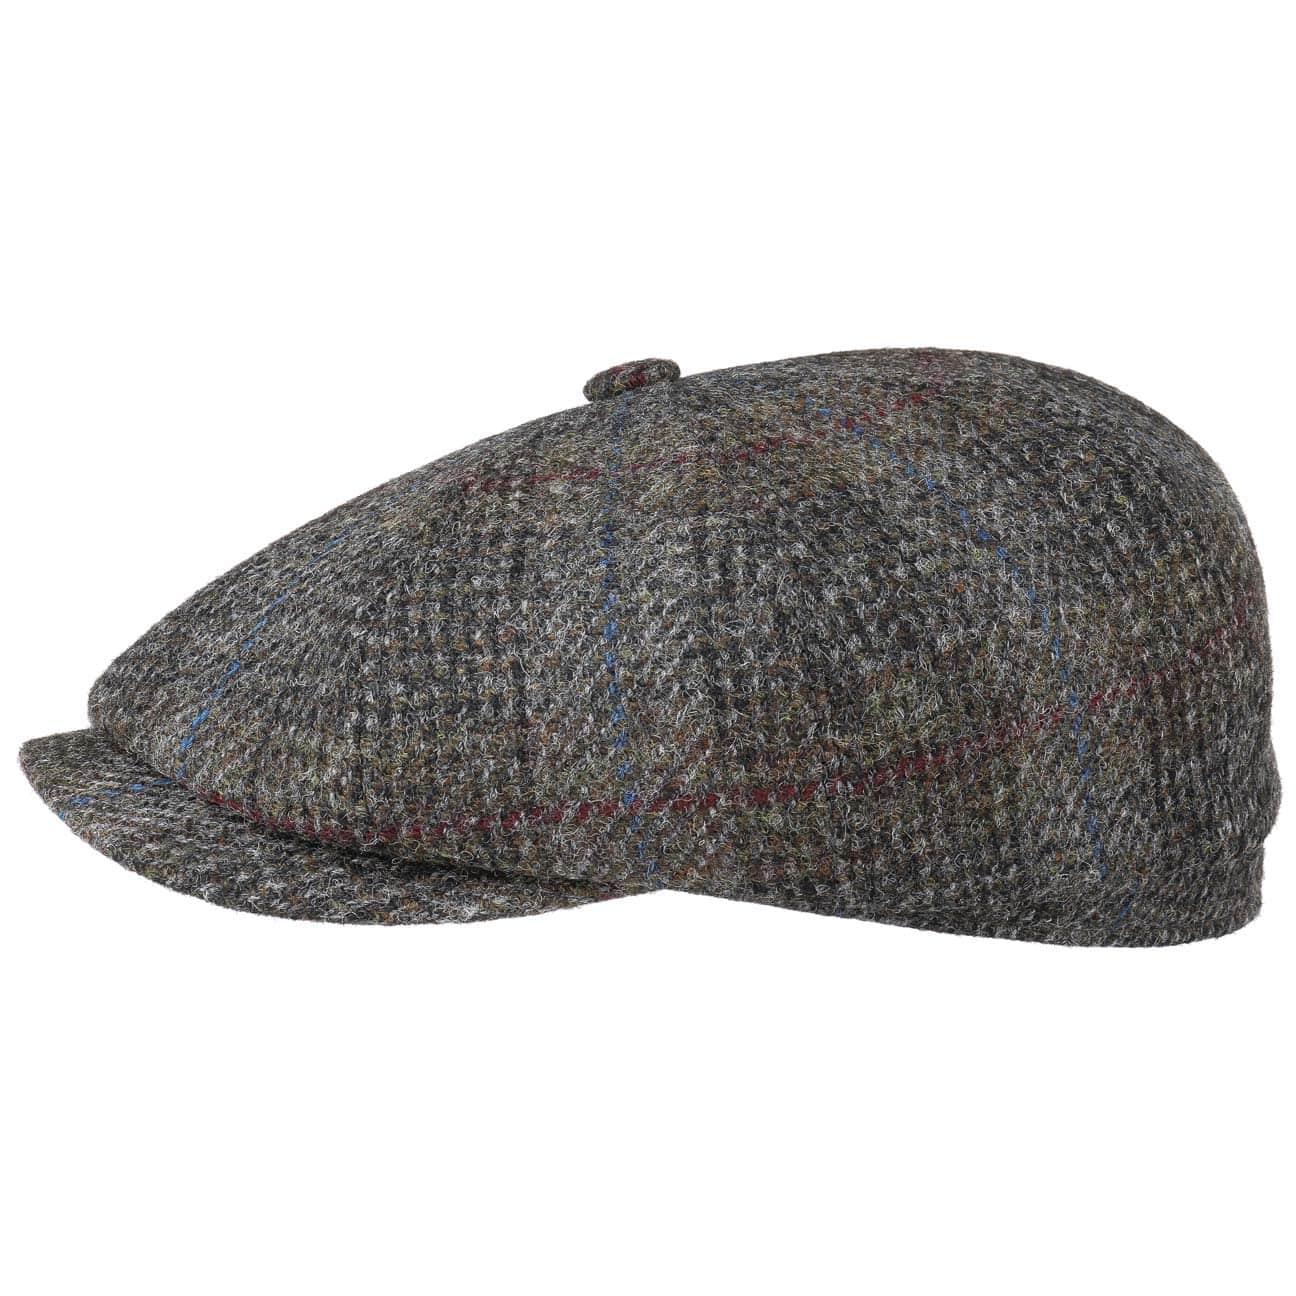 gorra-hatteras-harris-tweed-check-by-stetson